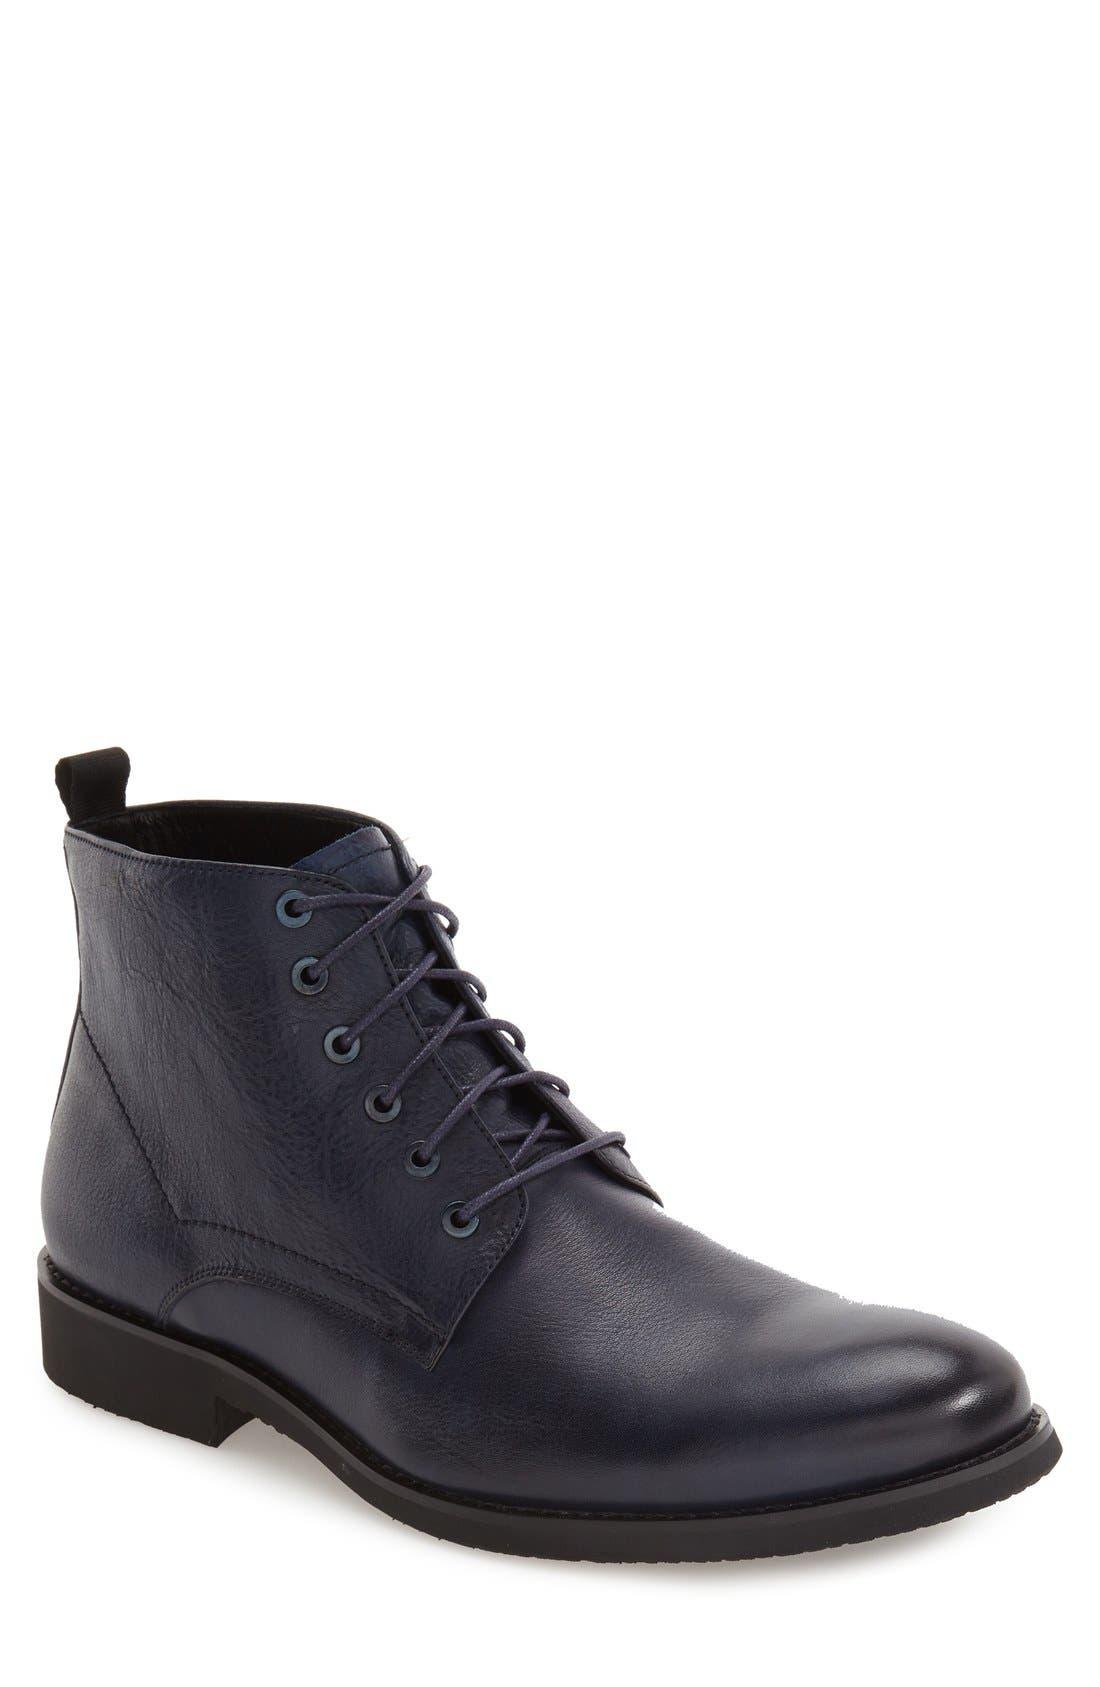 'Nereto' Plain Toe Boot,                             Main thumbnail 1, color,                             Navy